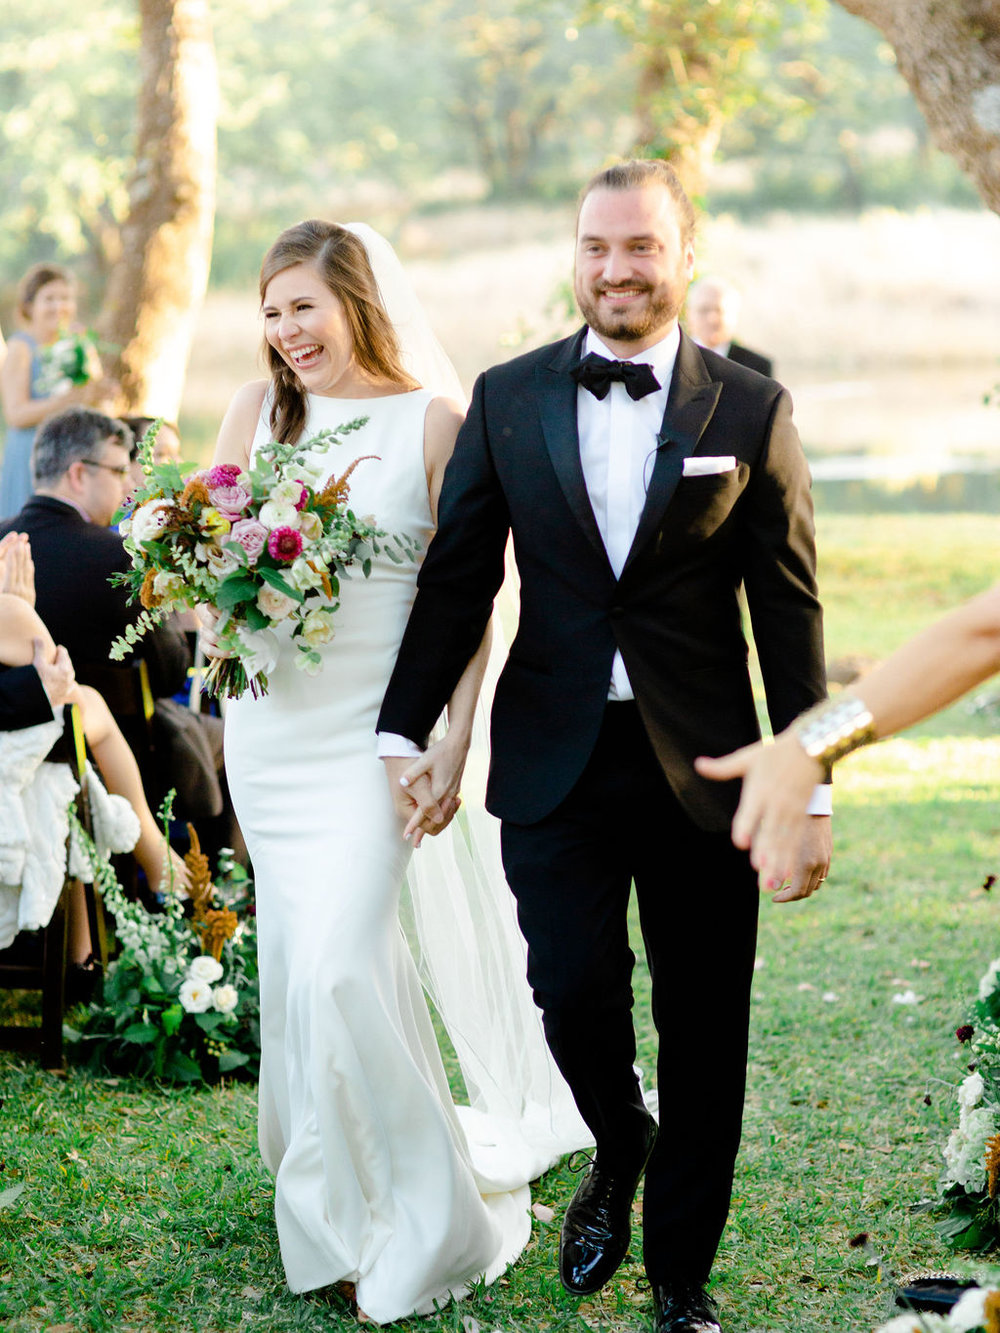 Austin-Texas-Wedding-Photographer-Addison-Grove-Film-94.jpg